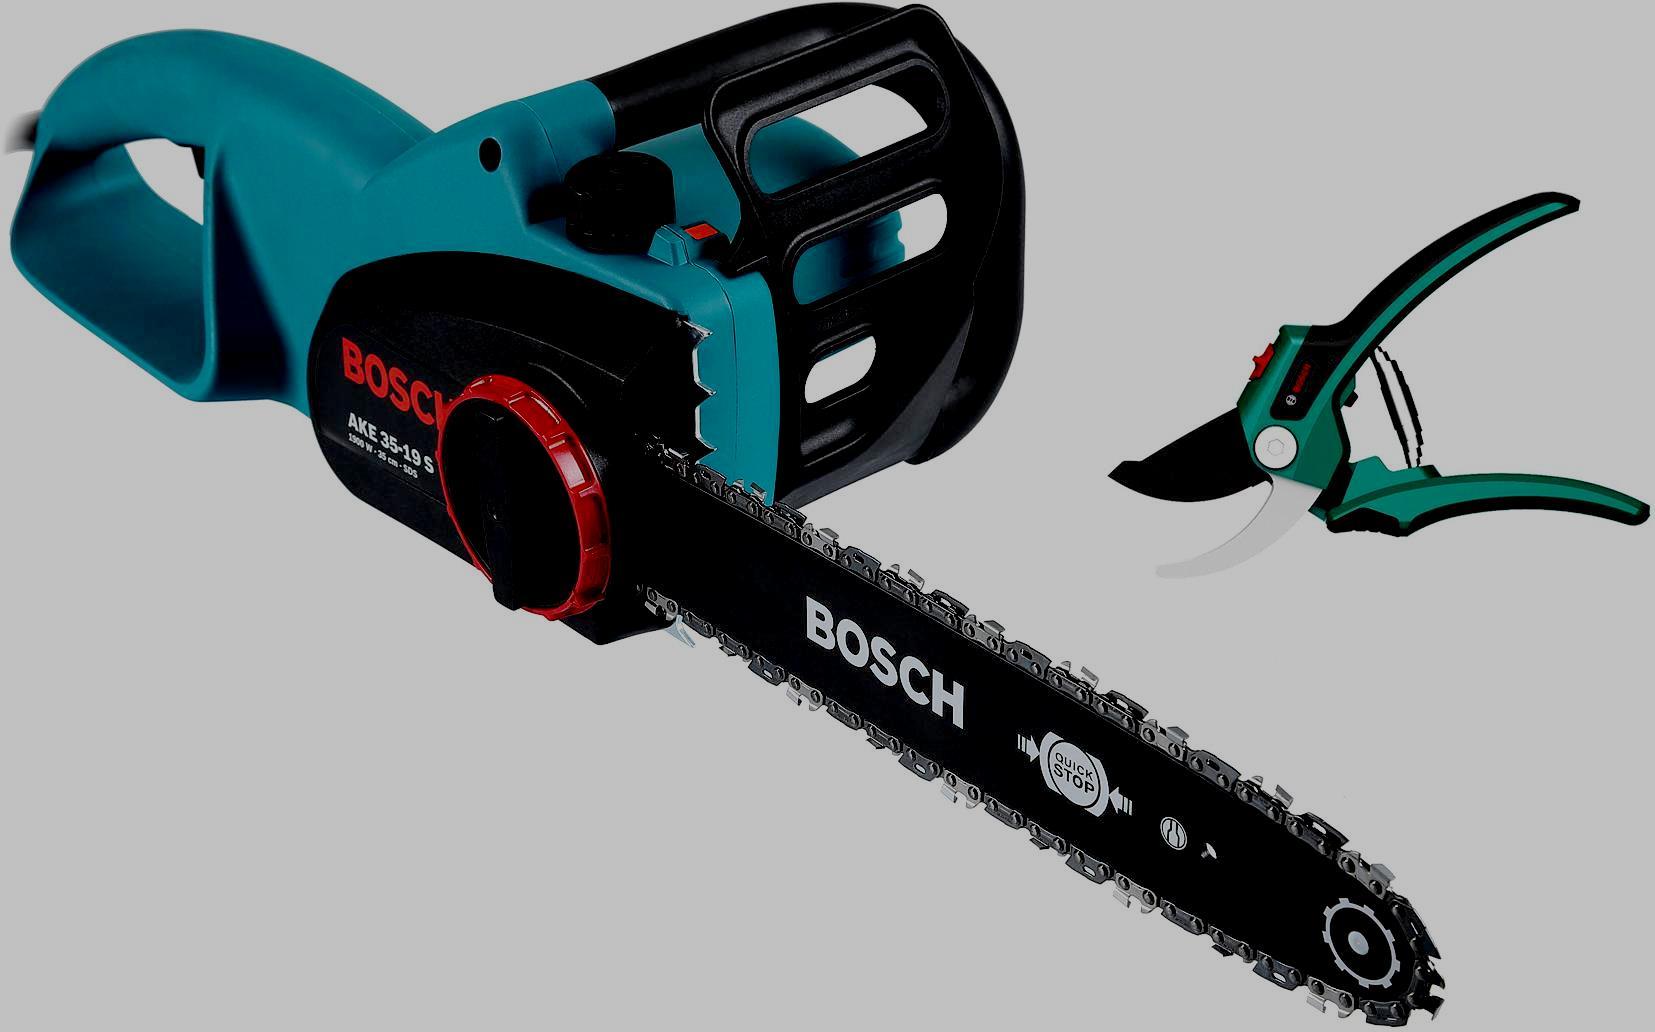 Bosch AKE 35 – 19 S